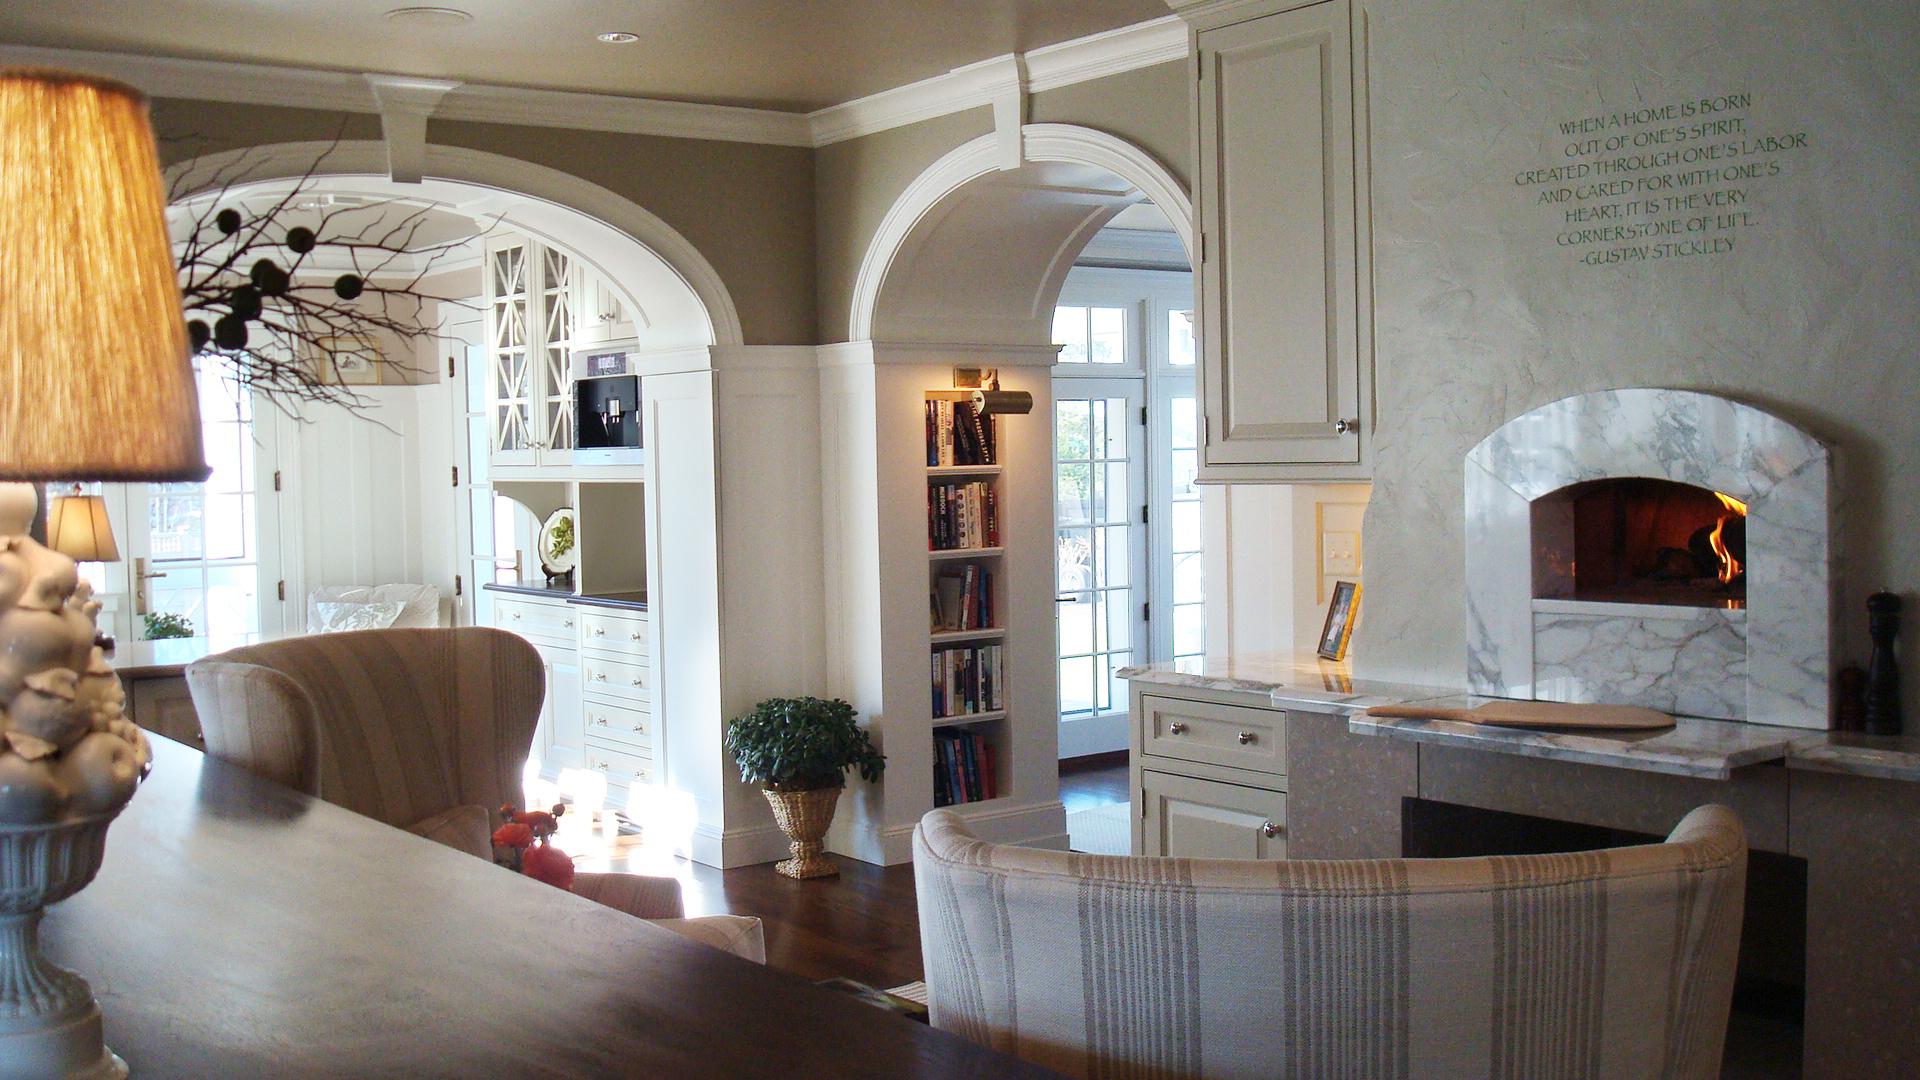 Renovation-coloinial-pizza-oven-old-greenwich-ct-interior-w